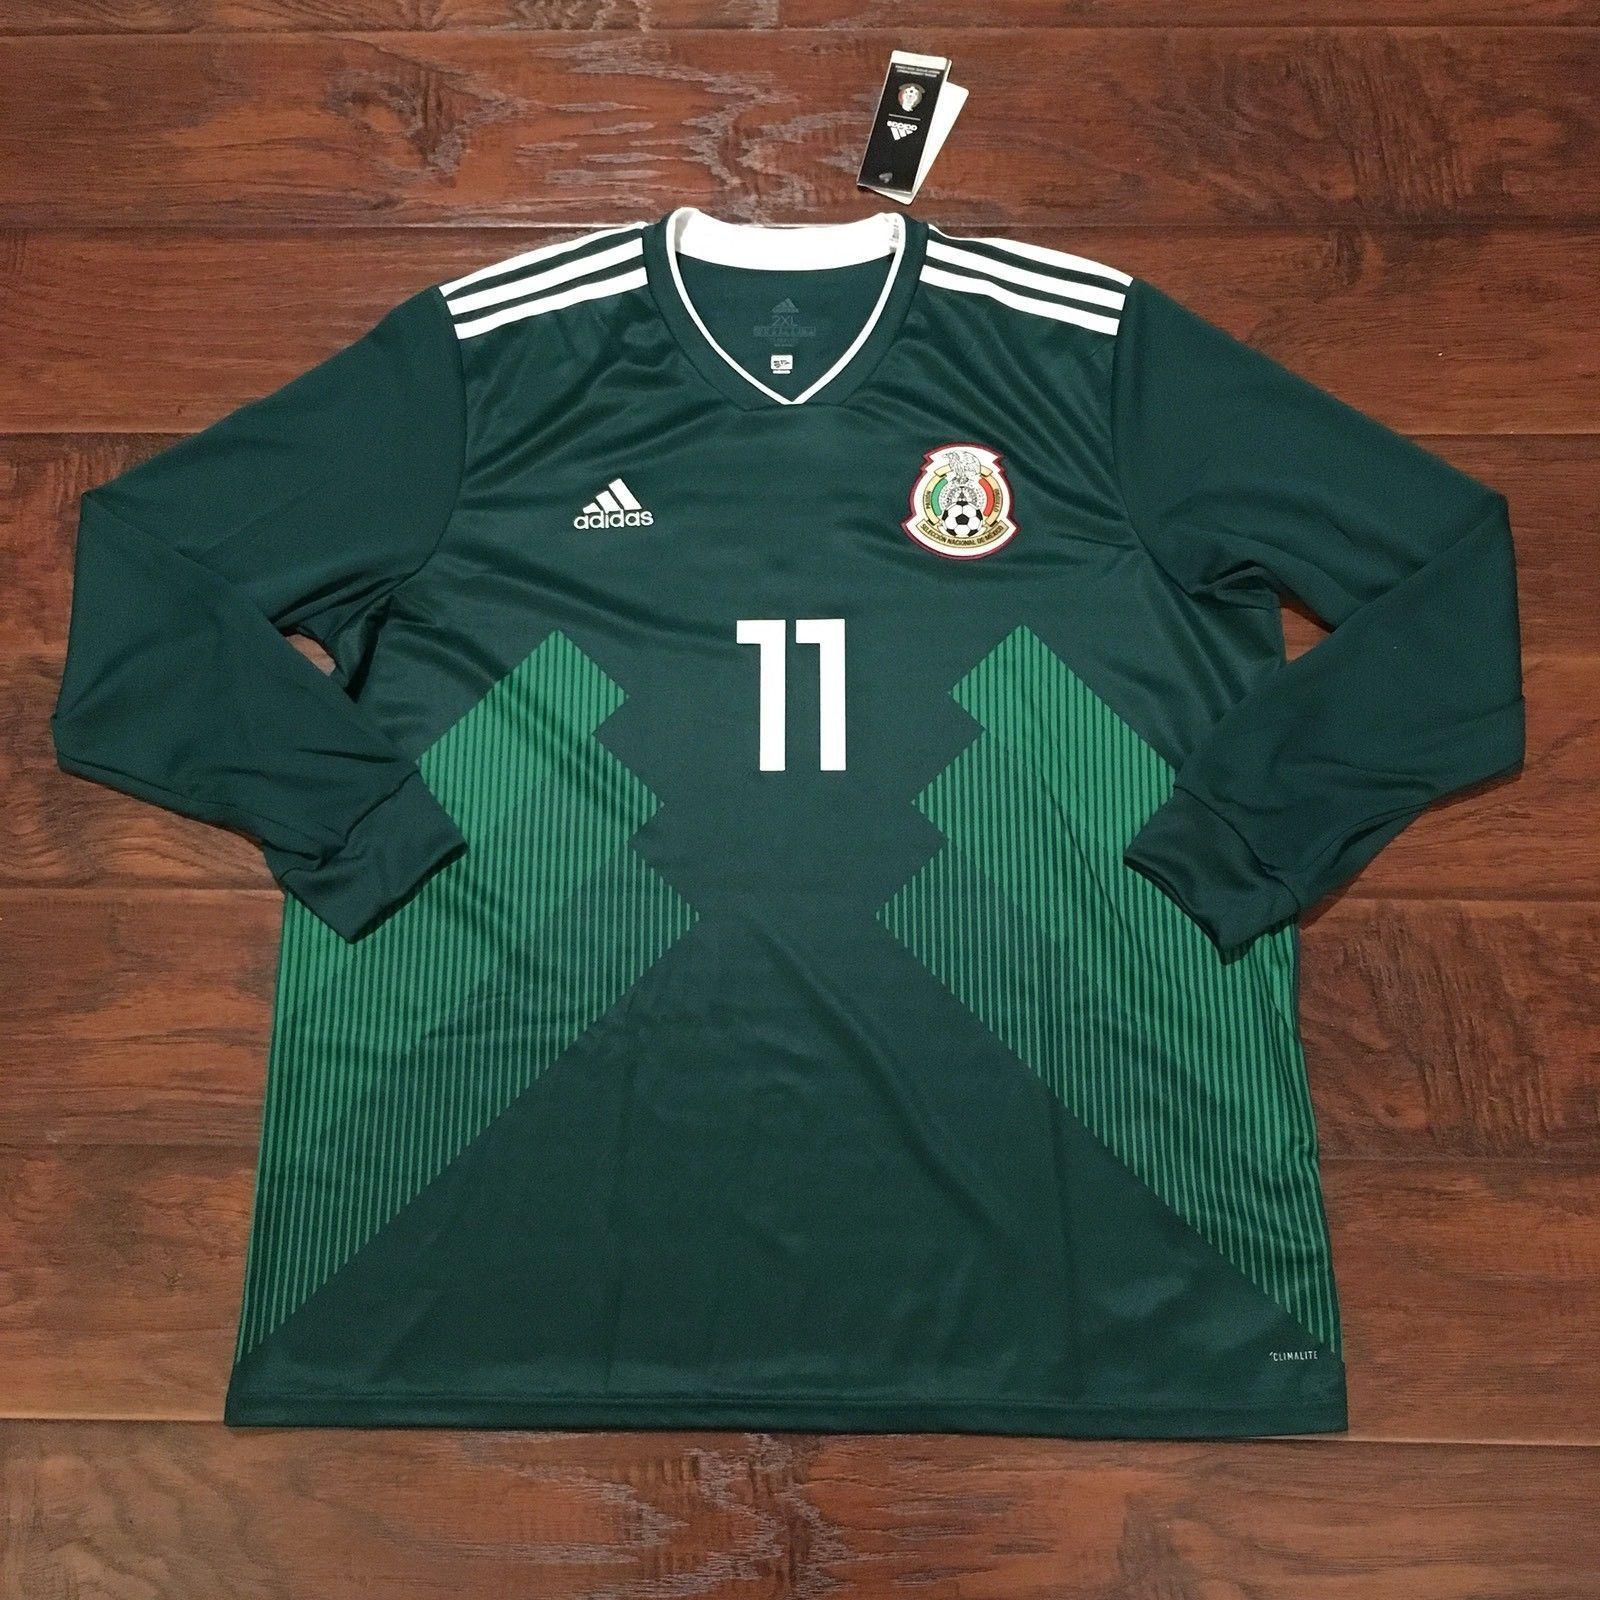 2018 Mexico Home Jersey 11 Carlos Vela 2xl L S Adidas World Cup Fashion Big Size T Shirt Argentina Soccer